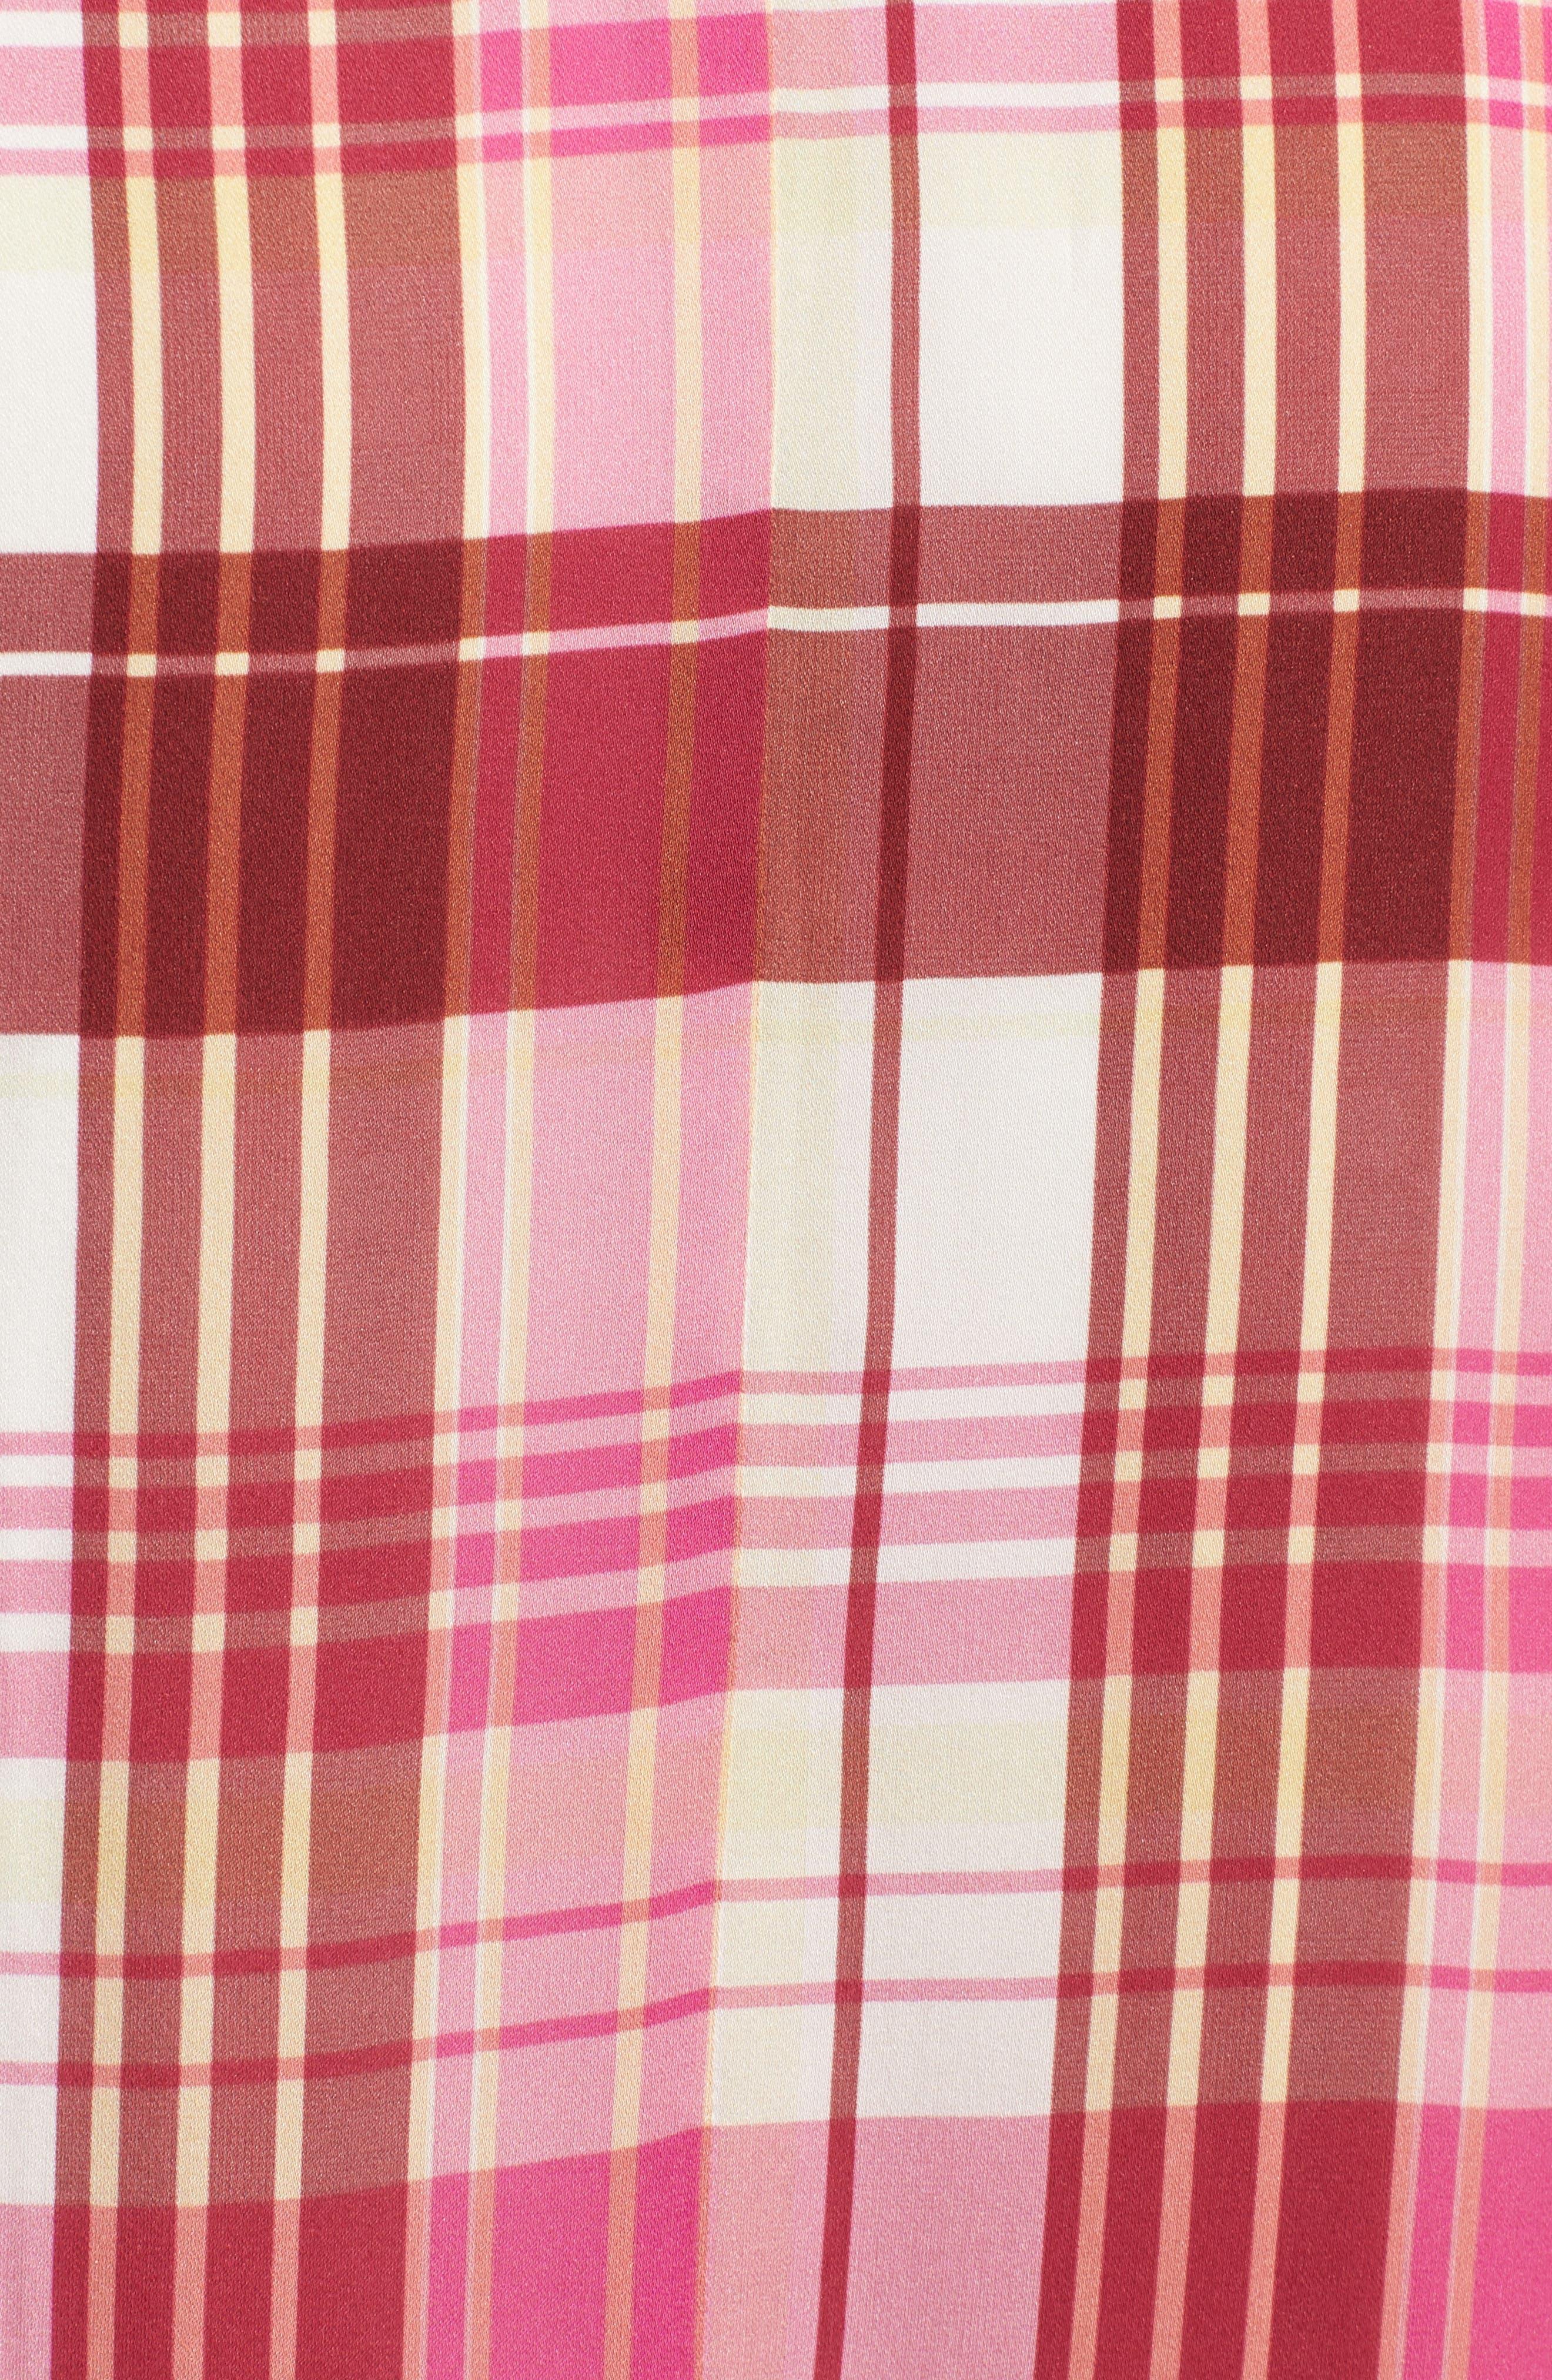 Plaid Silk Skirt,                             Alternate thumbnail 5, color,                             PINK PHLOX LARA PLAID